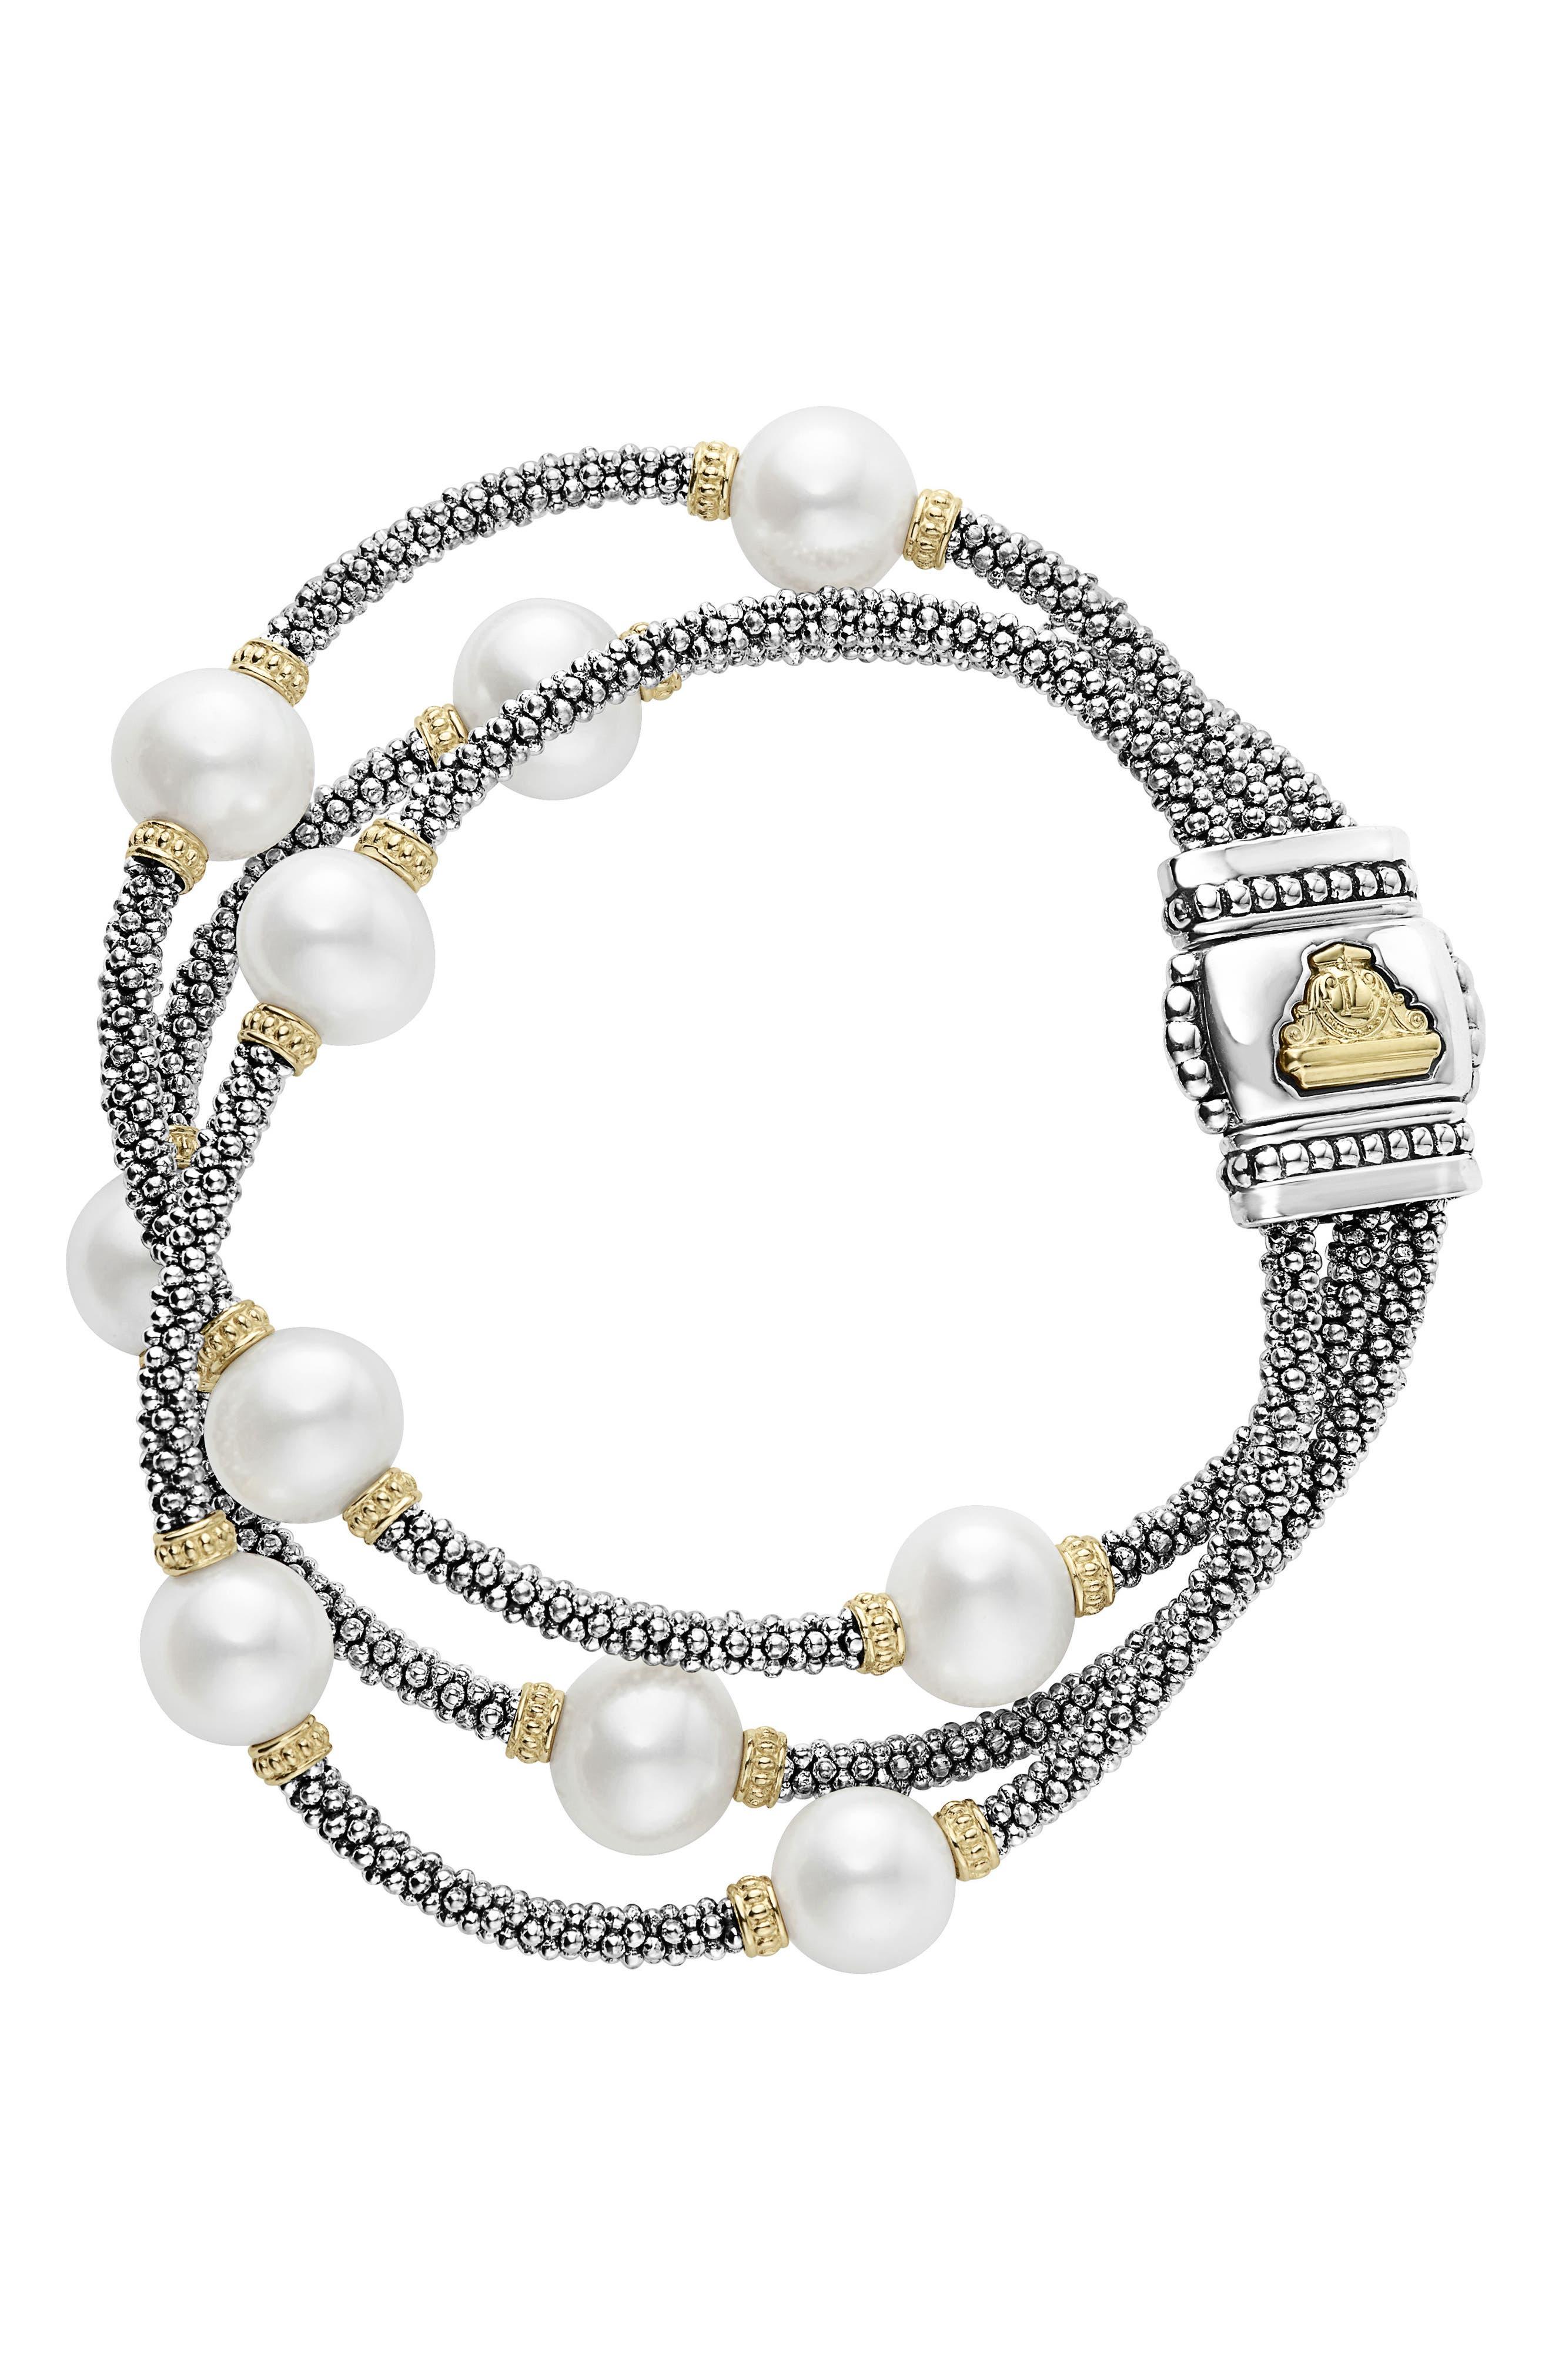 Main Image - LAGOS Luna Pearl Caviar Multistrand Bracelet